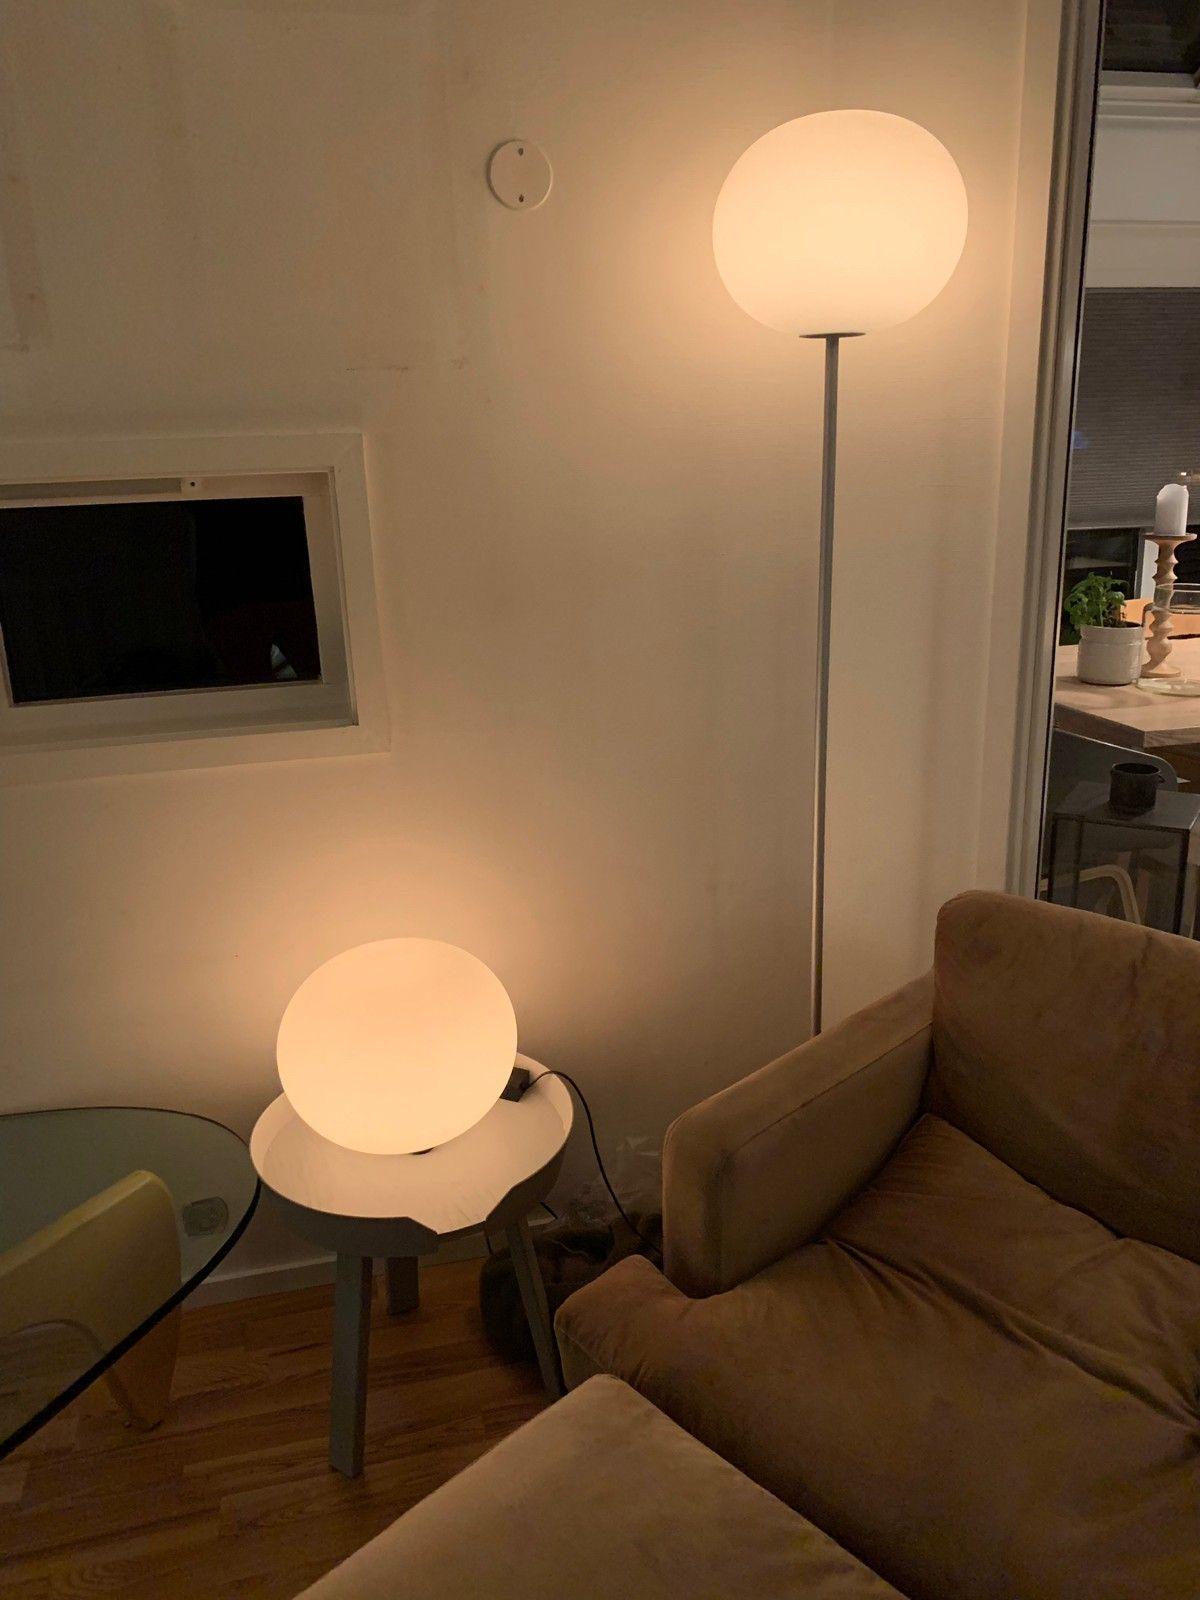 Glo Ball gulv | Møbelgalleriet Stavanger | Designmøbler